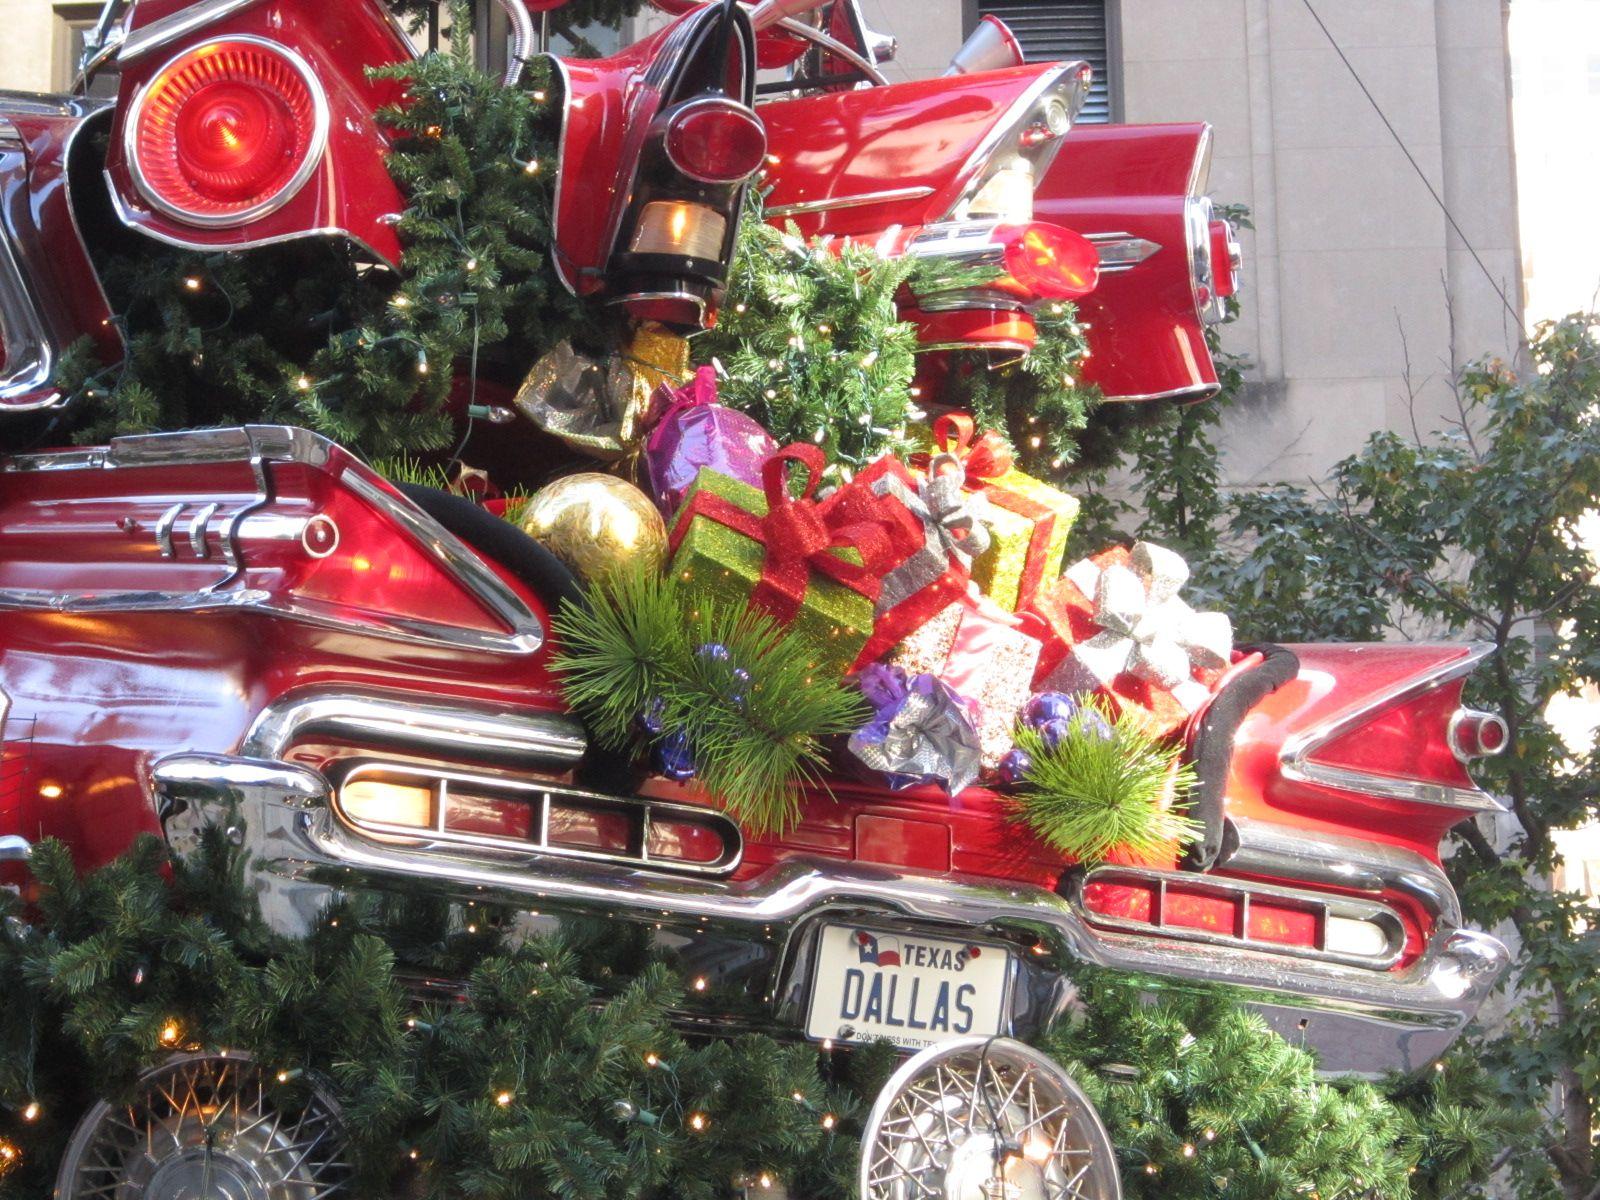 Neiman Marcus Car Tree Dallas Pegasus Plaza | Holiday: Christmas ...